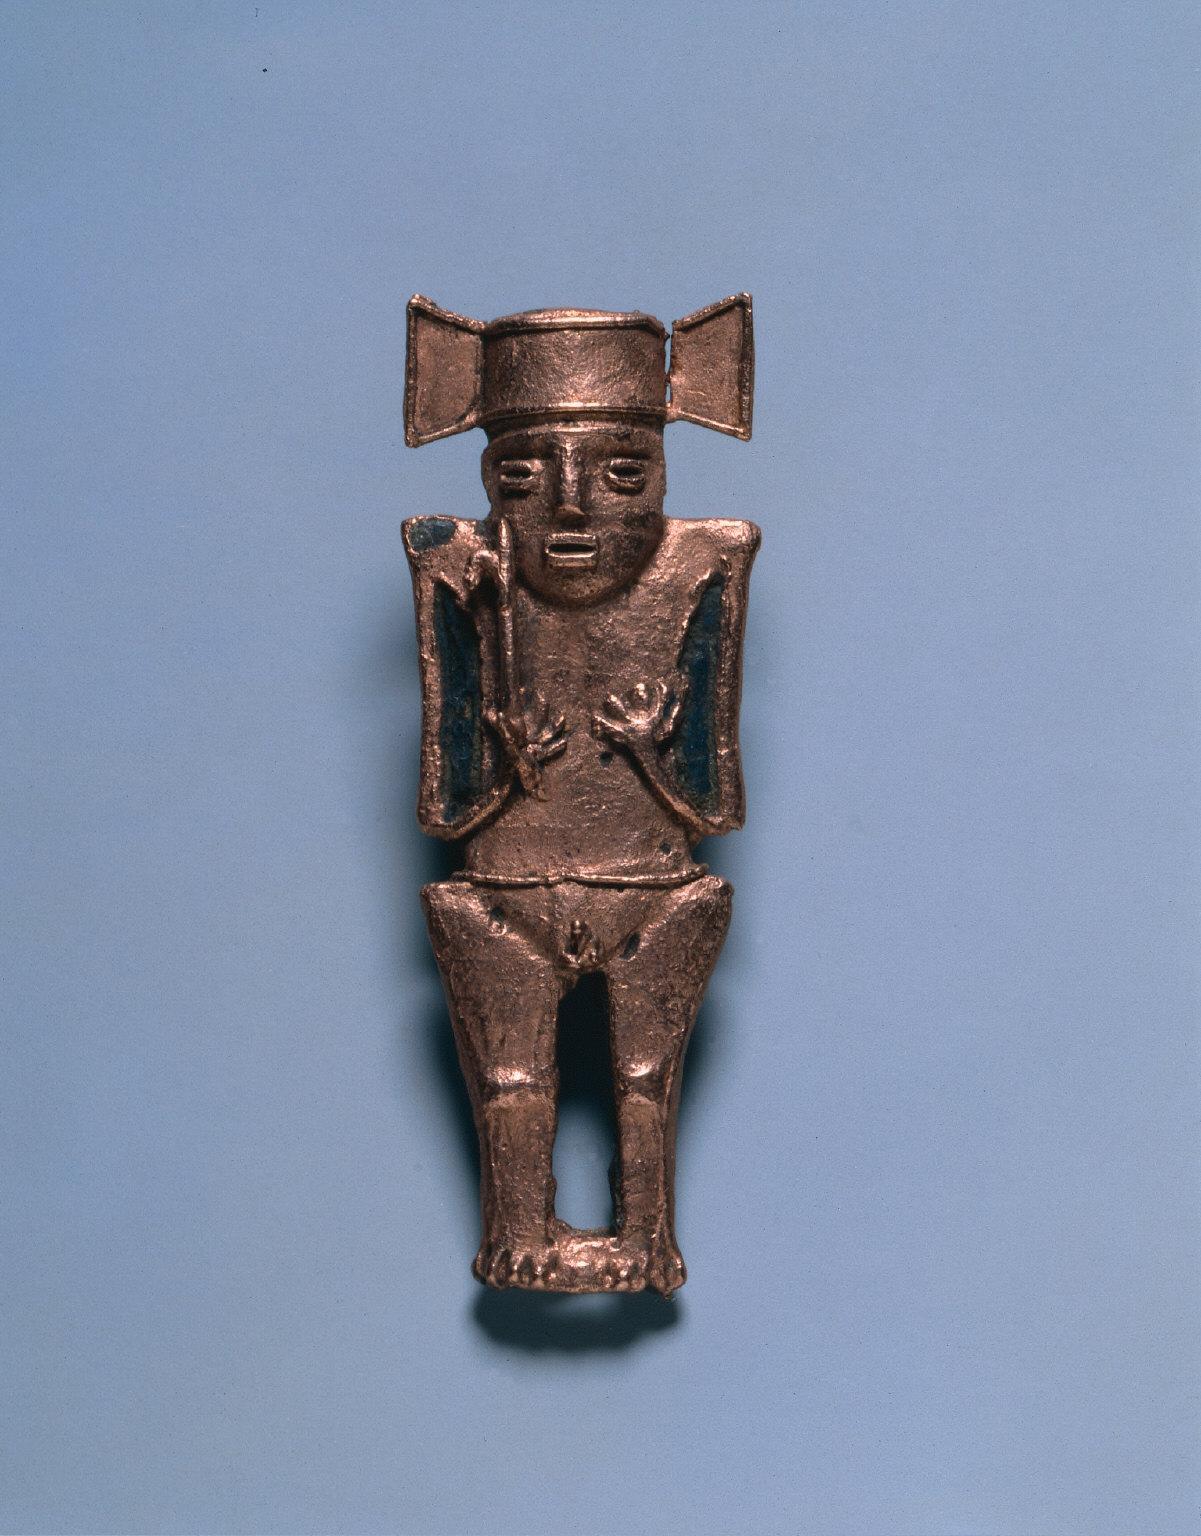 Votive Figurine with Spearthrower